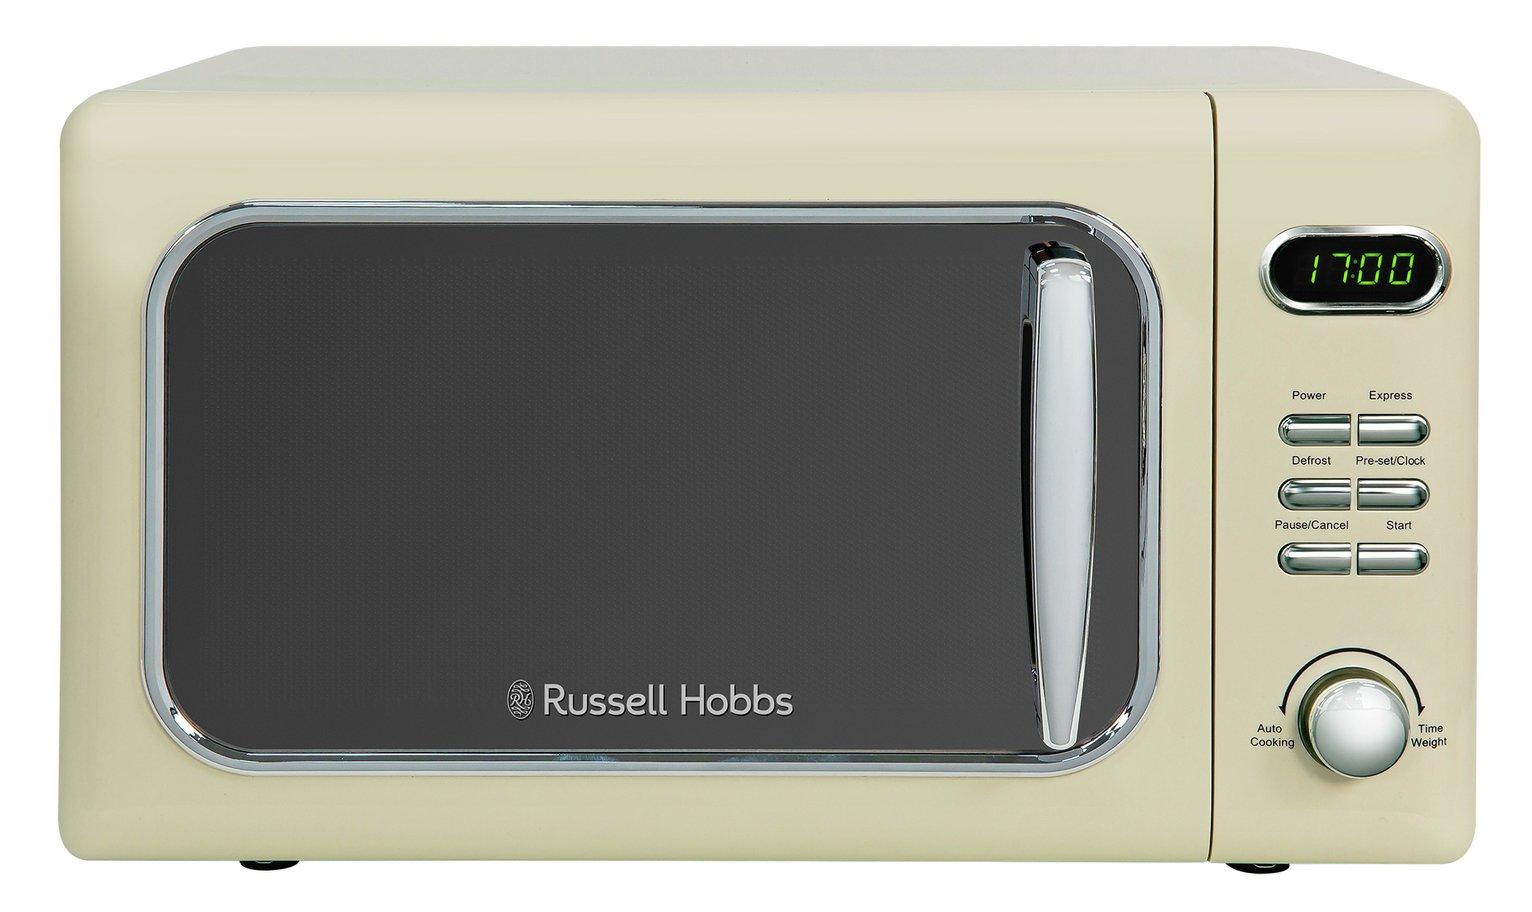 Russell Hobbs 700W Standard Microwave RHMD718C - Cream